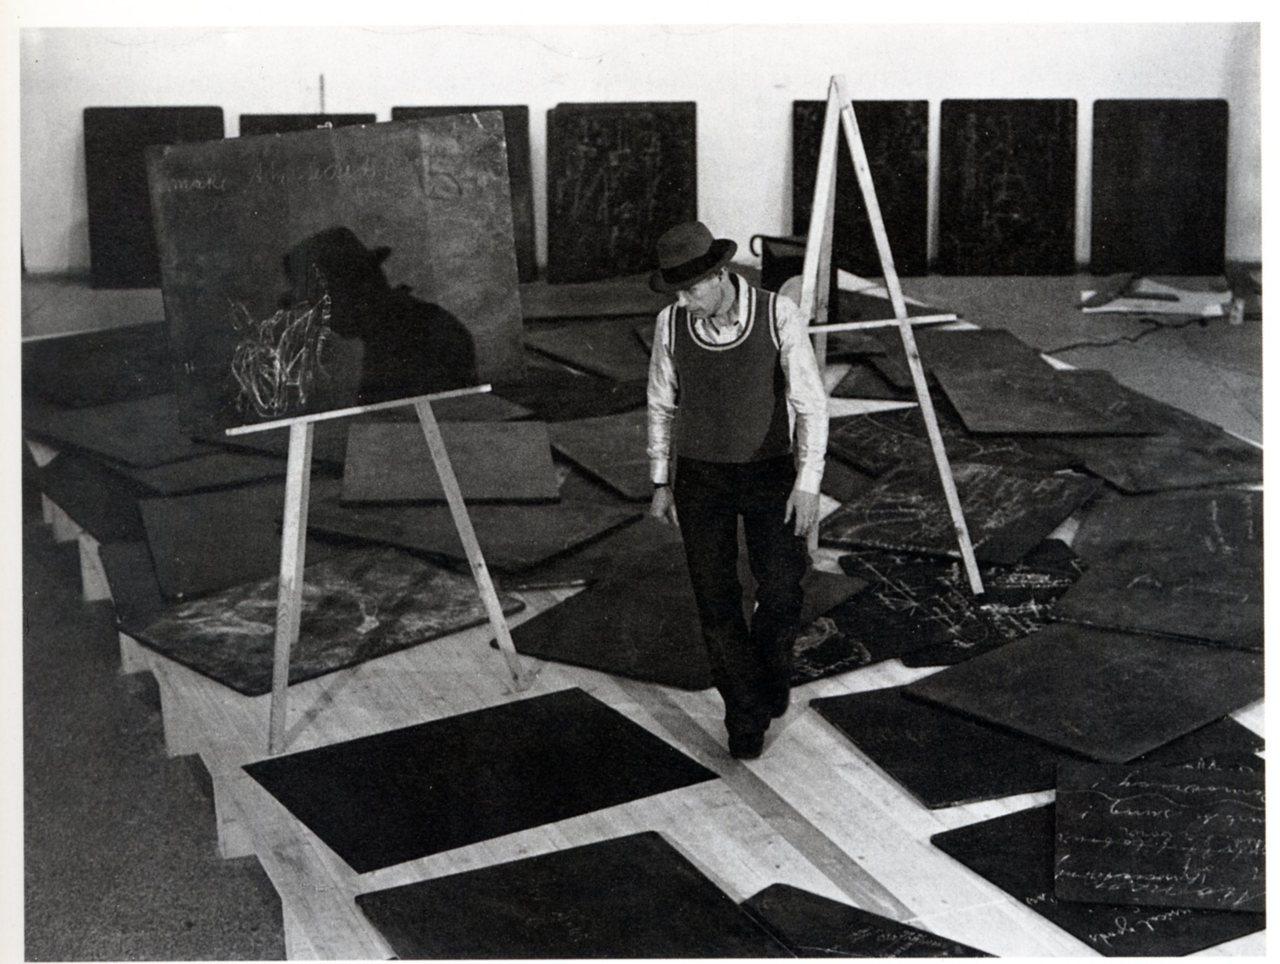 Joseph Beuys at documenta 5, 1972.